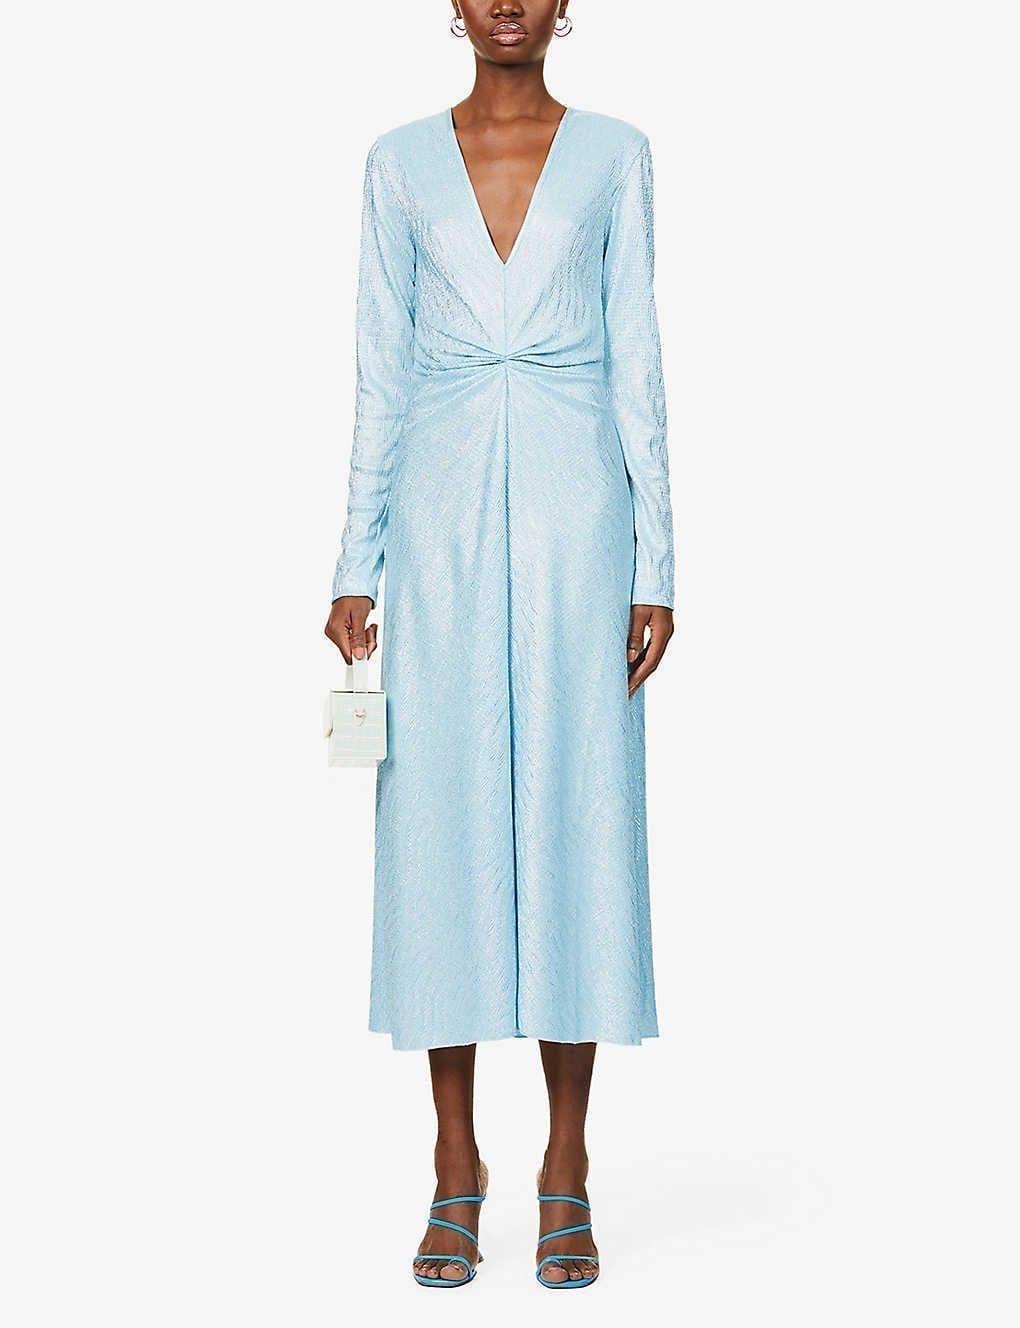 ROTATE BIRGER CHRISTENSEN Sierra V-neck Woven Midi Dress